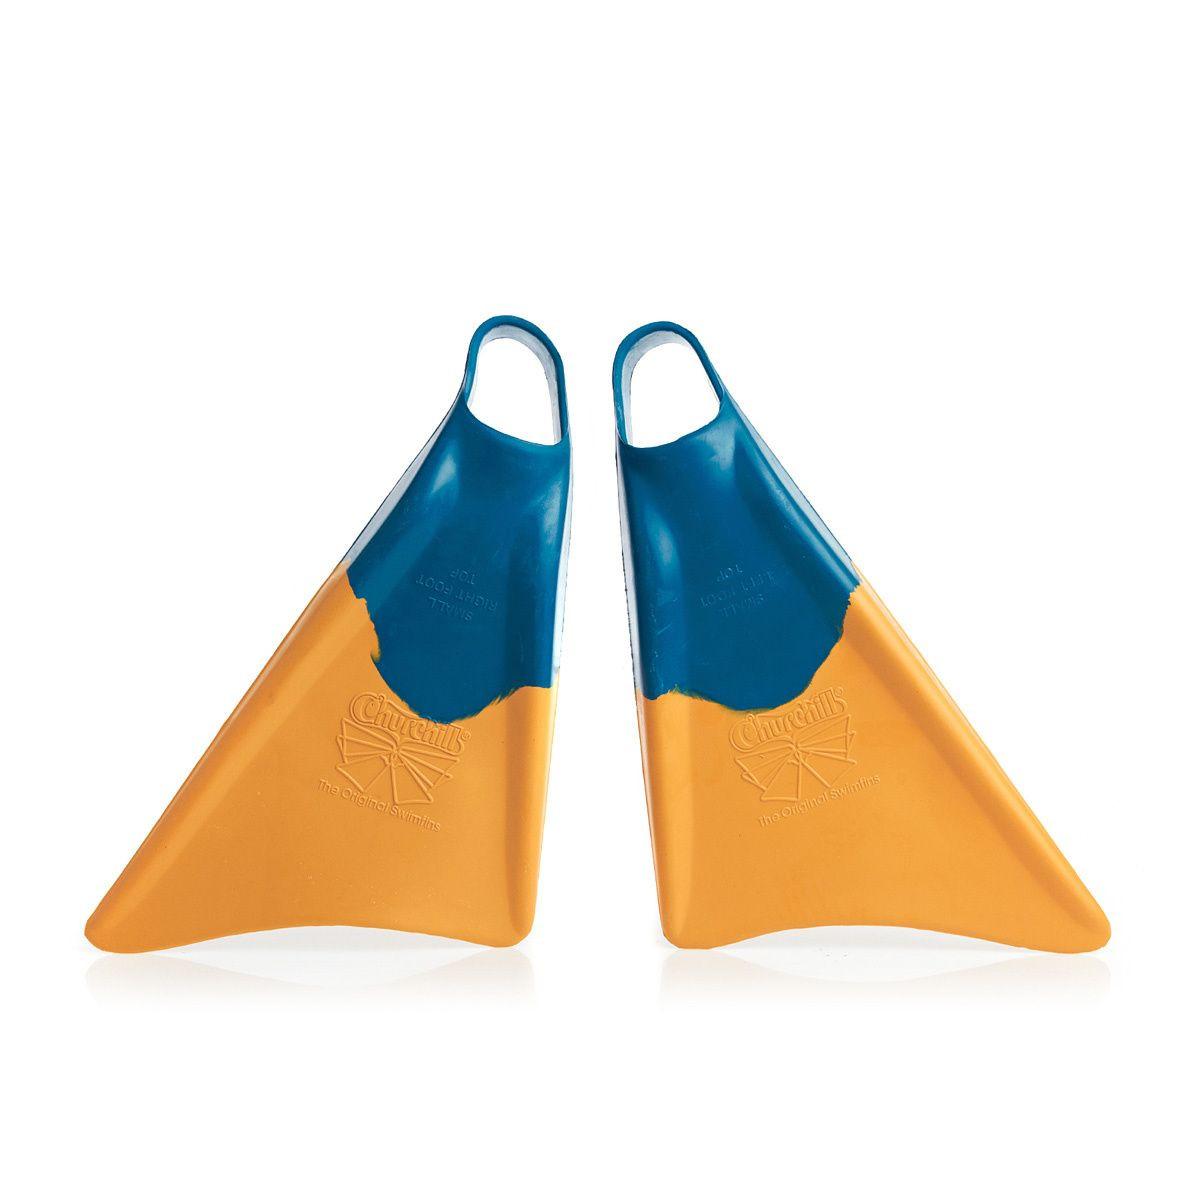 Churchill Makapuu Bodyboard Fins - Blue/ Yellow